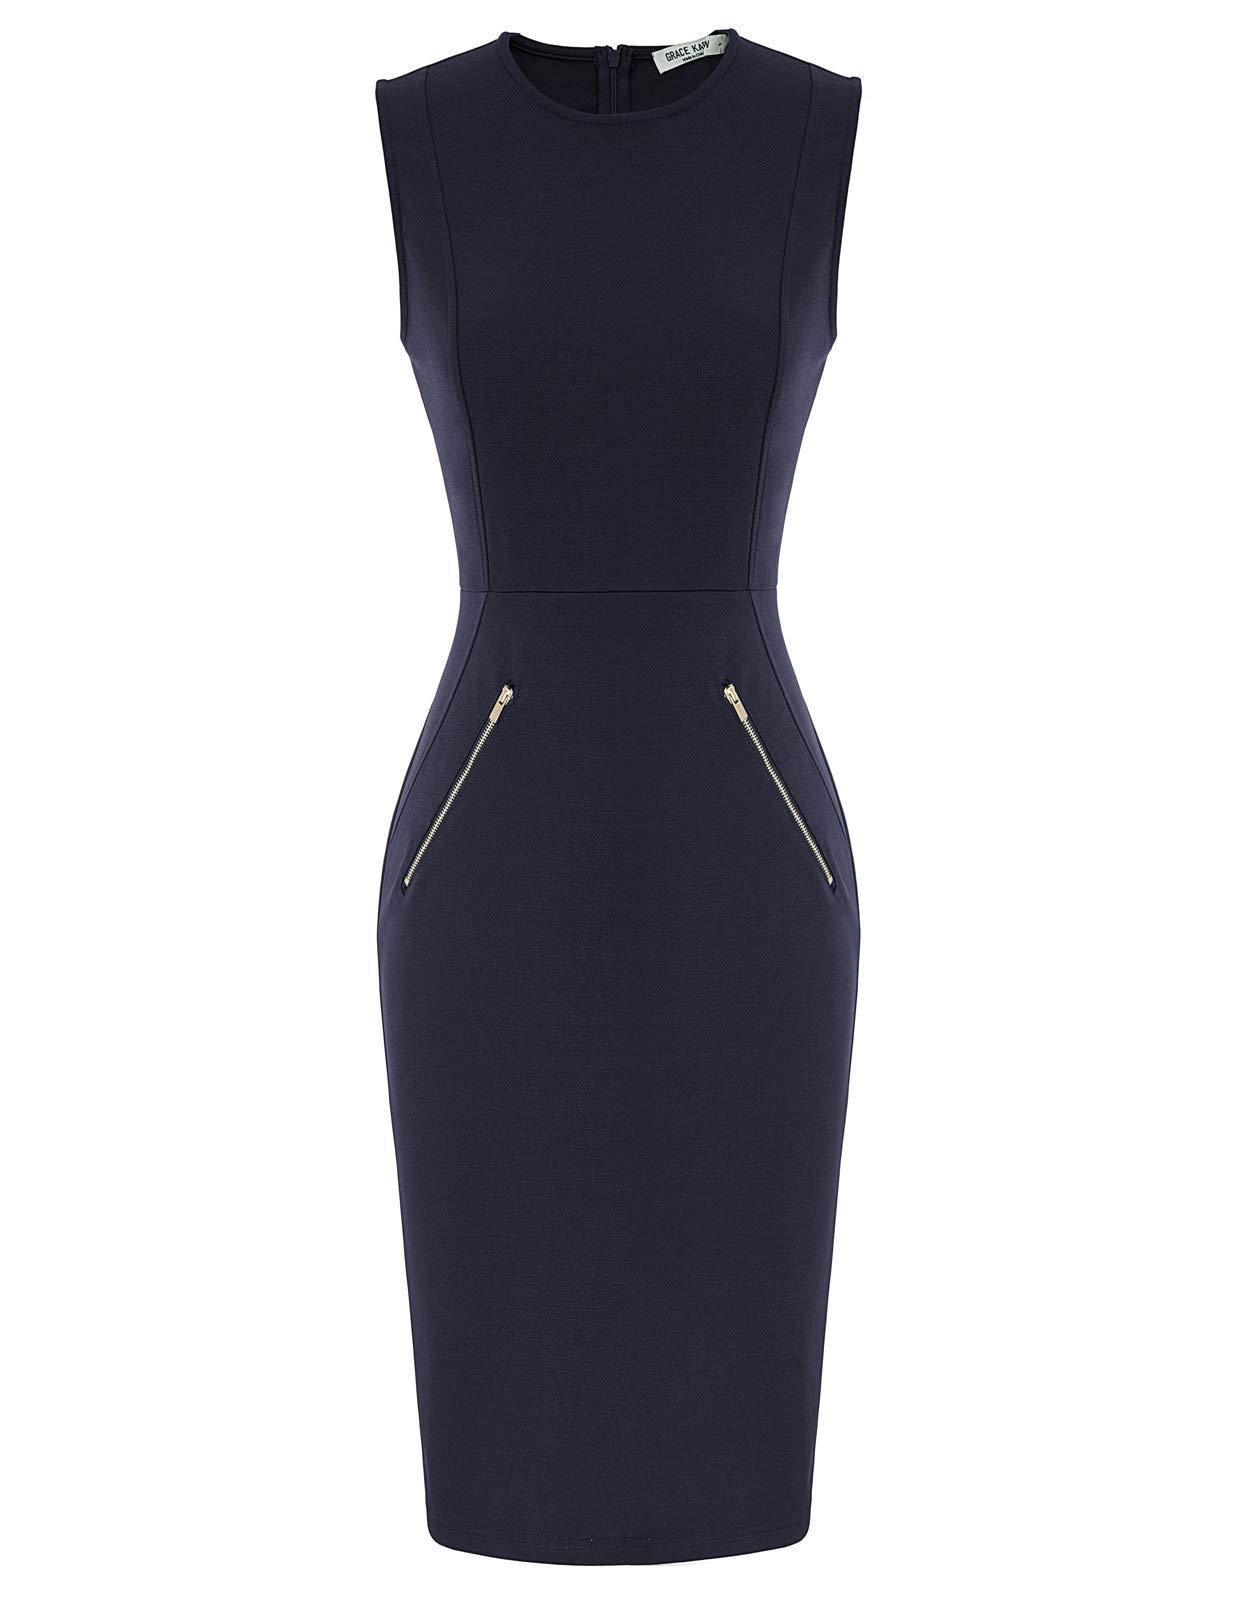 GRACE KARIN Women's Sleeveless Pocket Hips-Wrapped Bodycon Pencil Dress